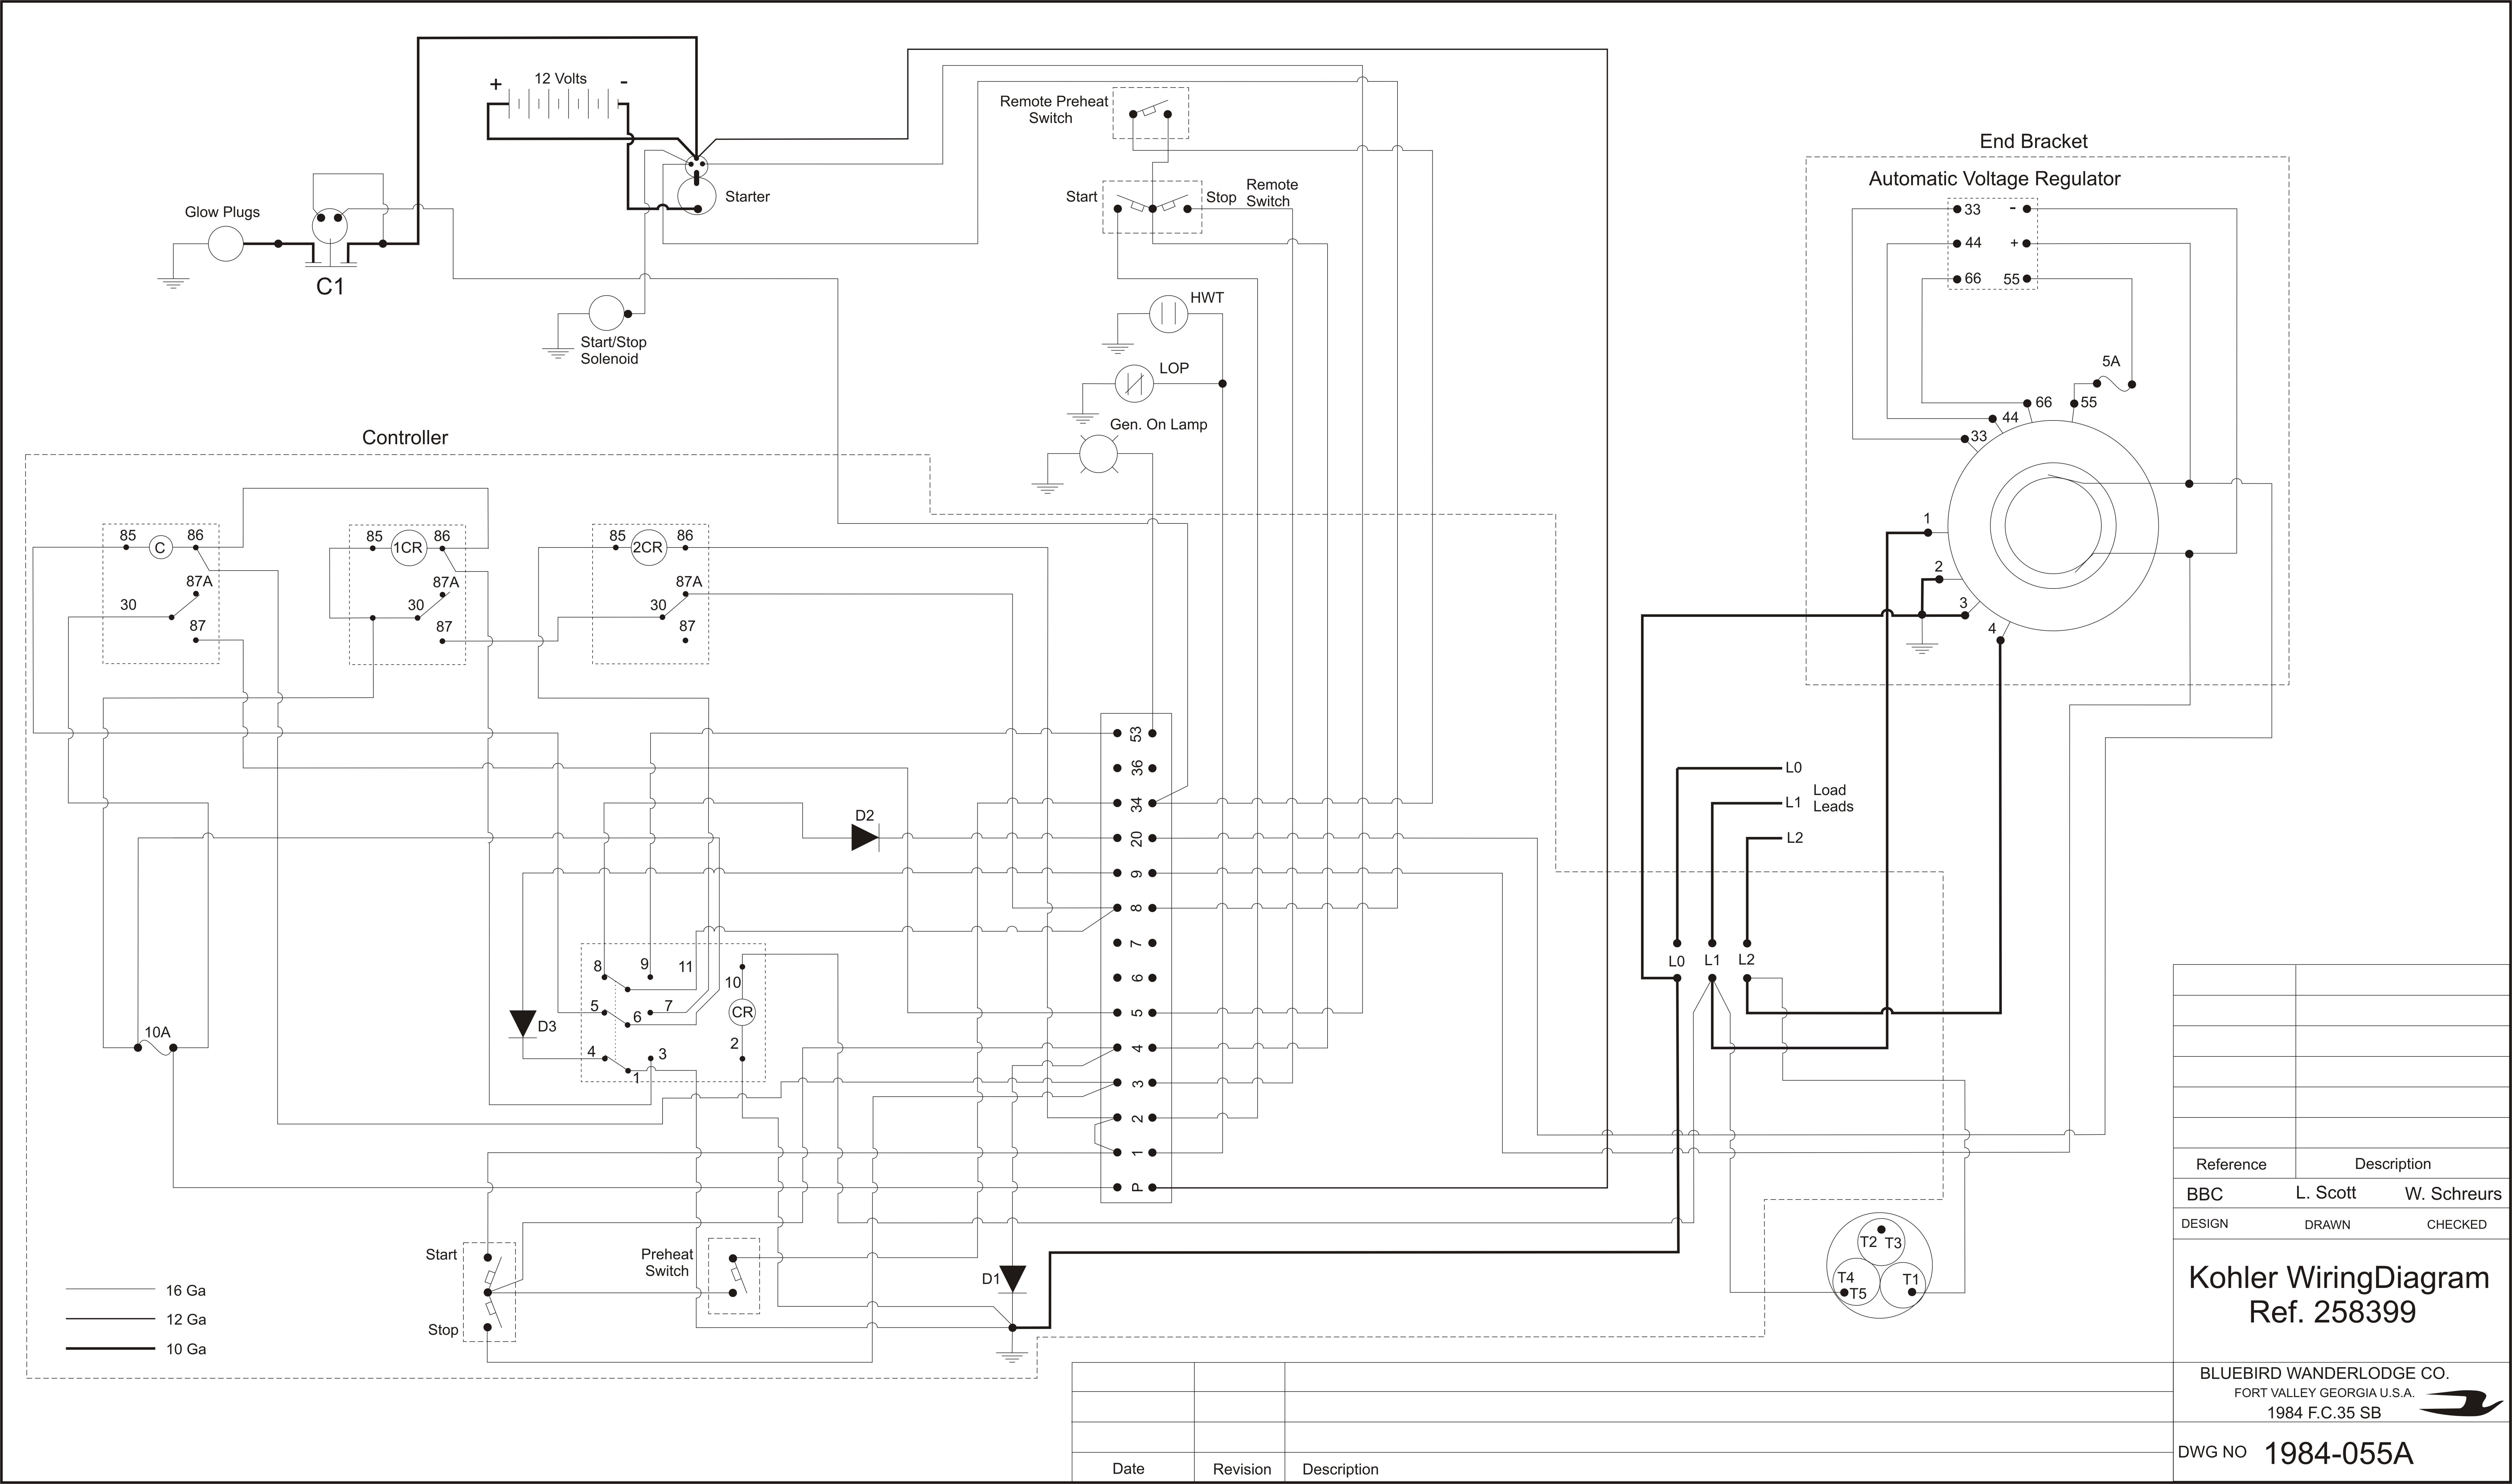 Cat 3176 Wiring Diagram Wiring Diagrams \u2022 Cat With Twin Turbo Engine  Diagram 3176 Cat Engine Wiring Diagram